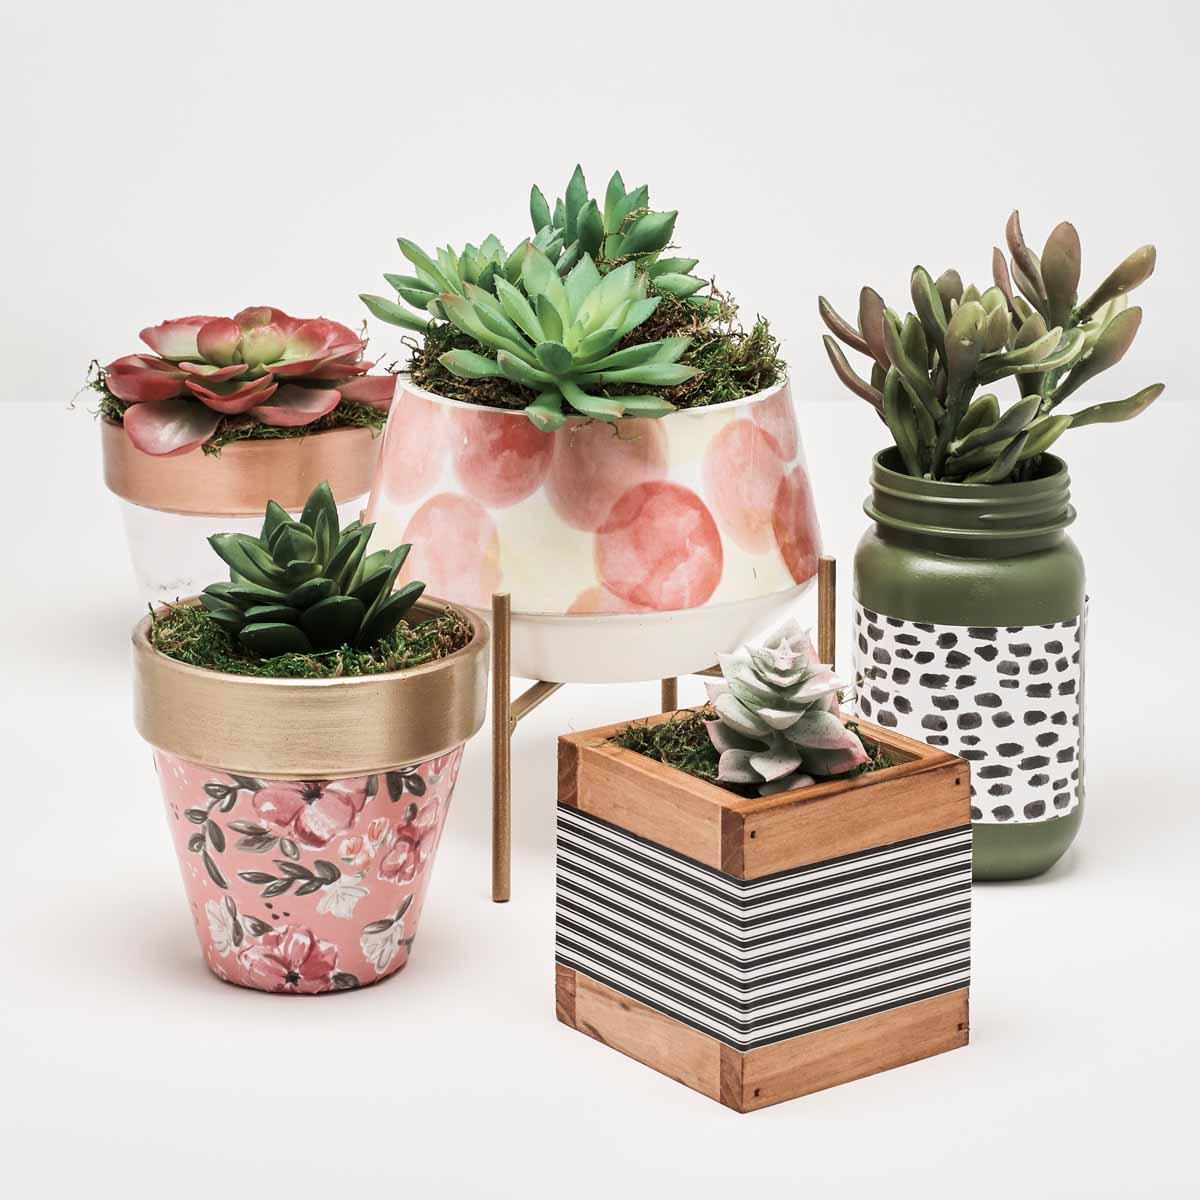 Mod Podge Planters